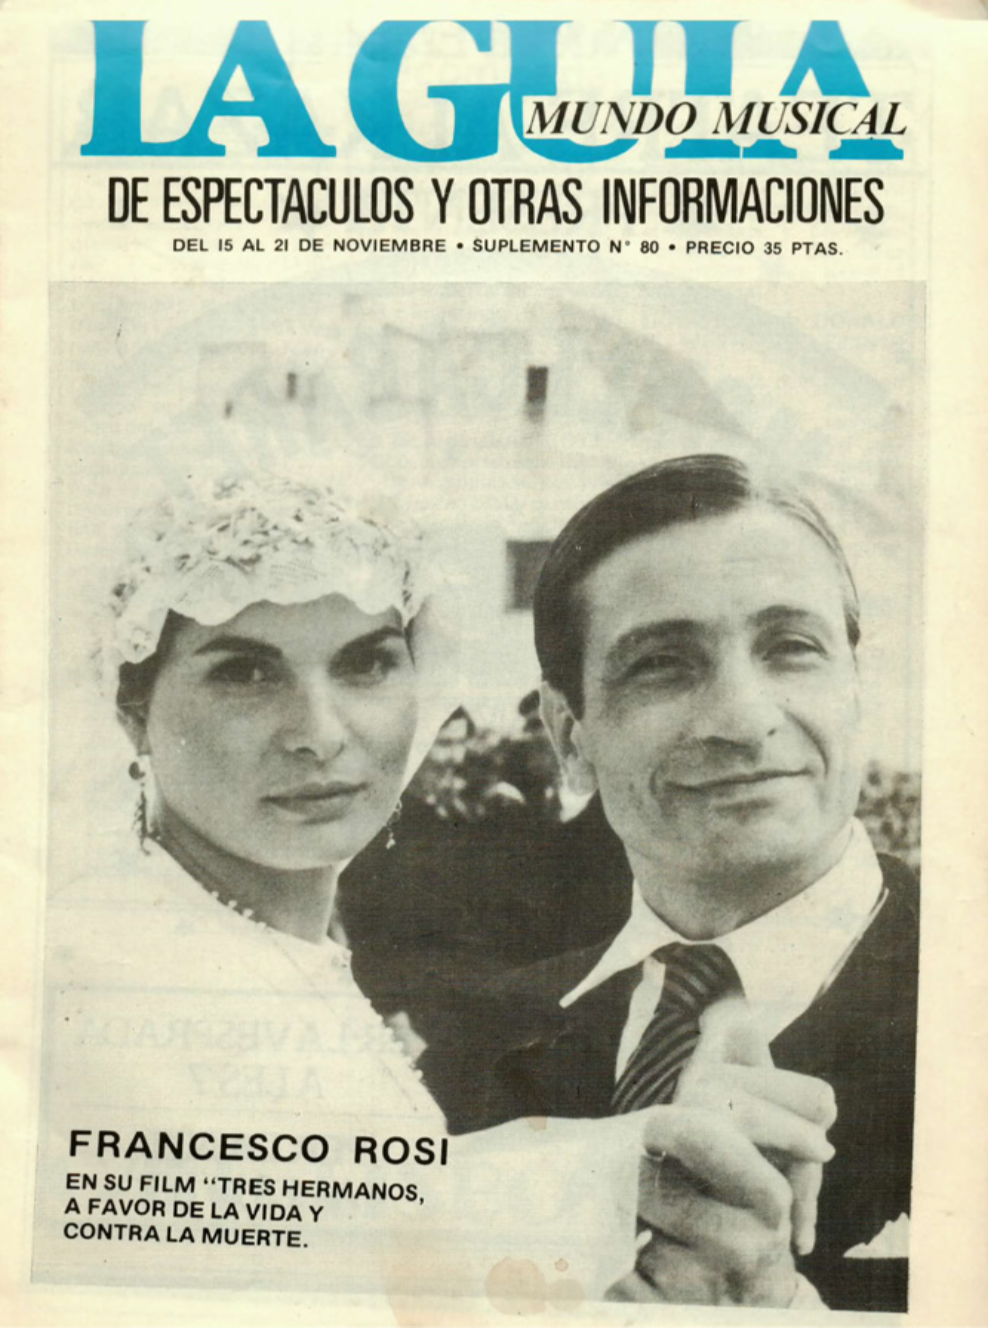 1982 Pavesos Nou i Mig Teatre Alkázar La Guia 15 novembre